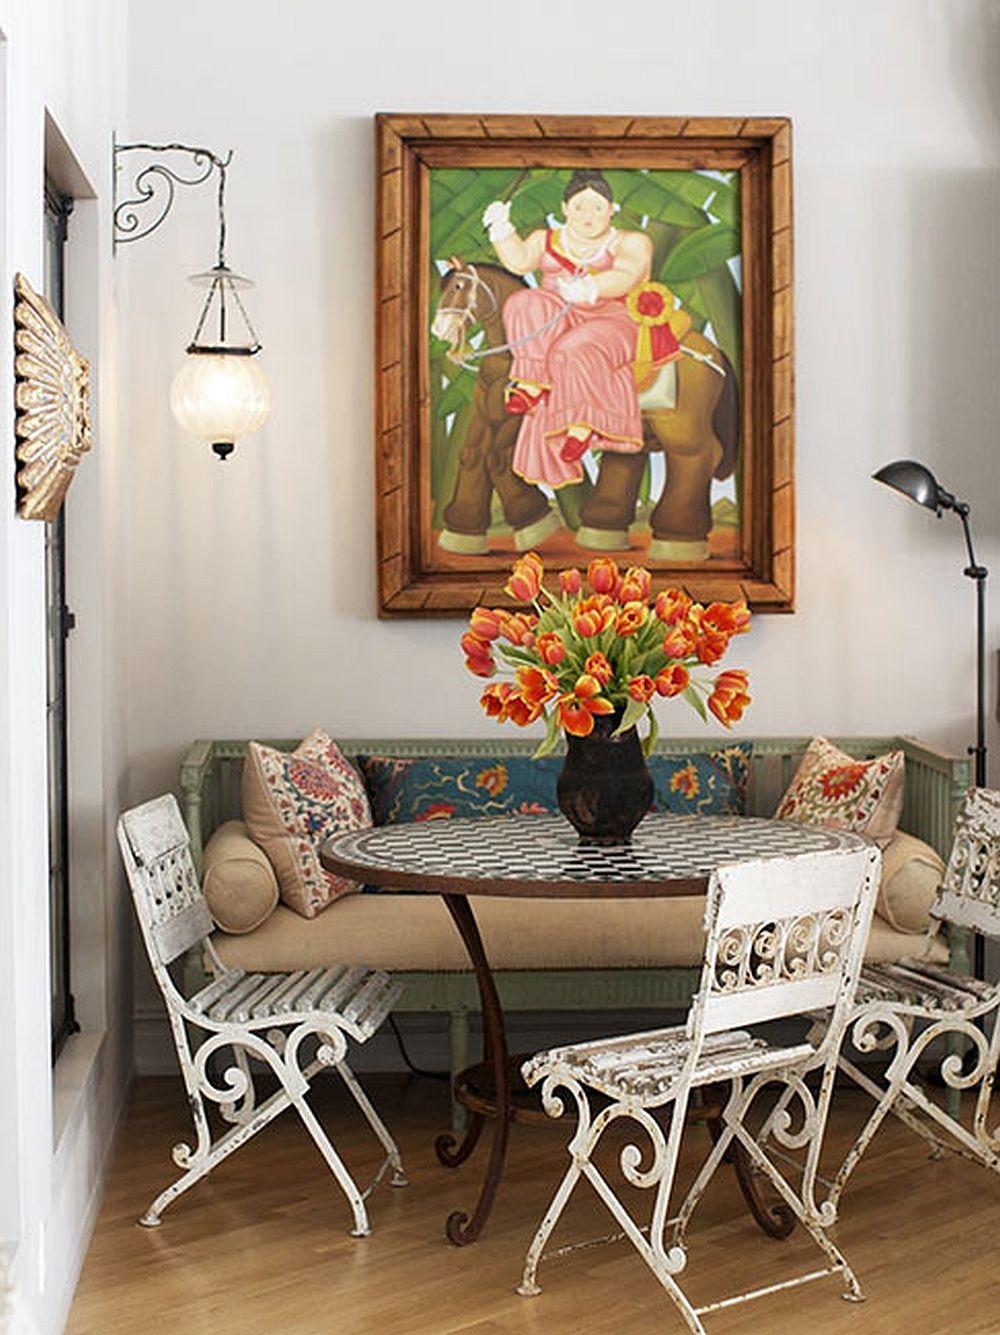 adelaparvu.com despre loft in stil eclectic cu influente marocane, morrocan style, designer Deborah French, Foto Yiorgos Kordakis (14)